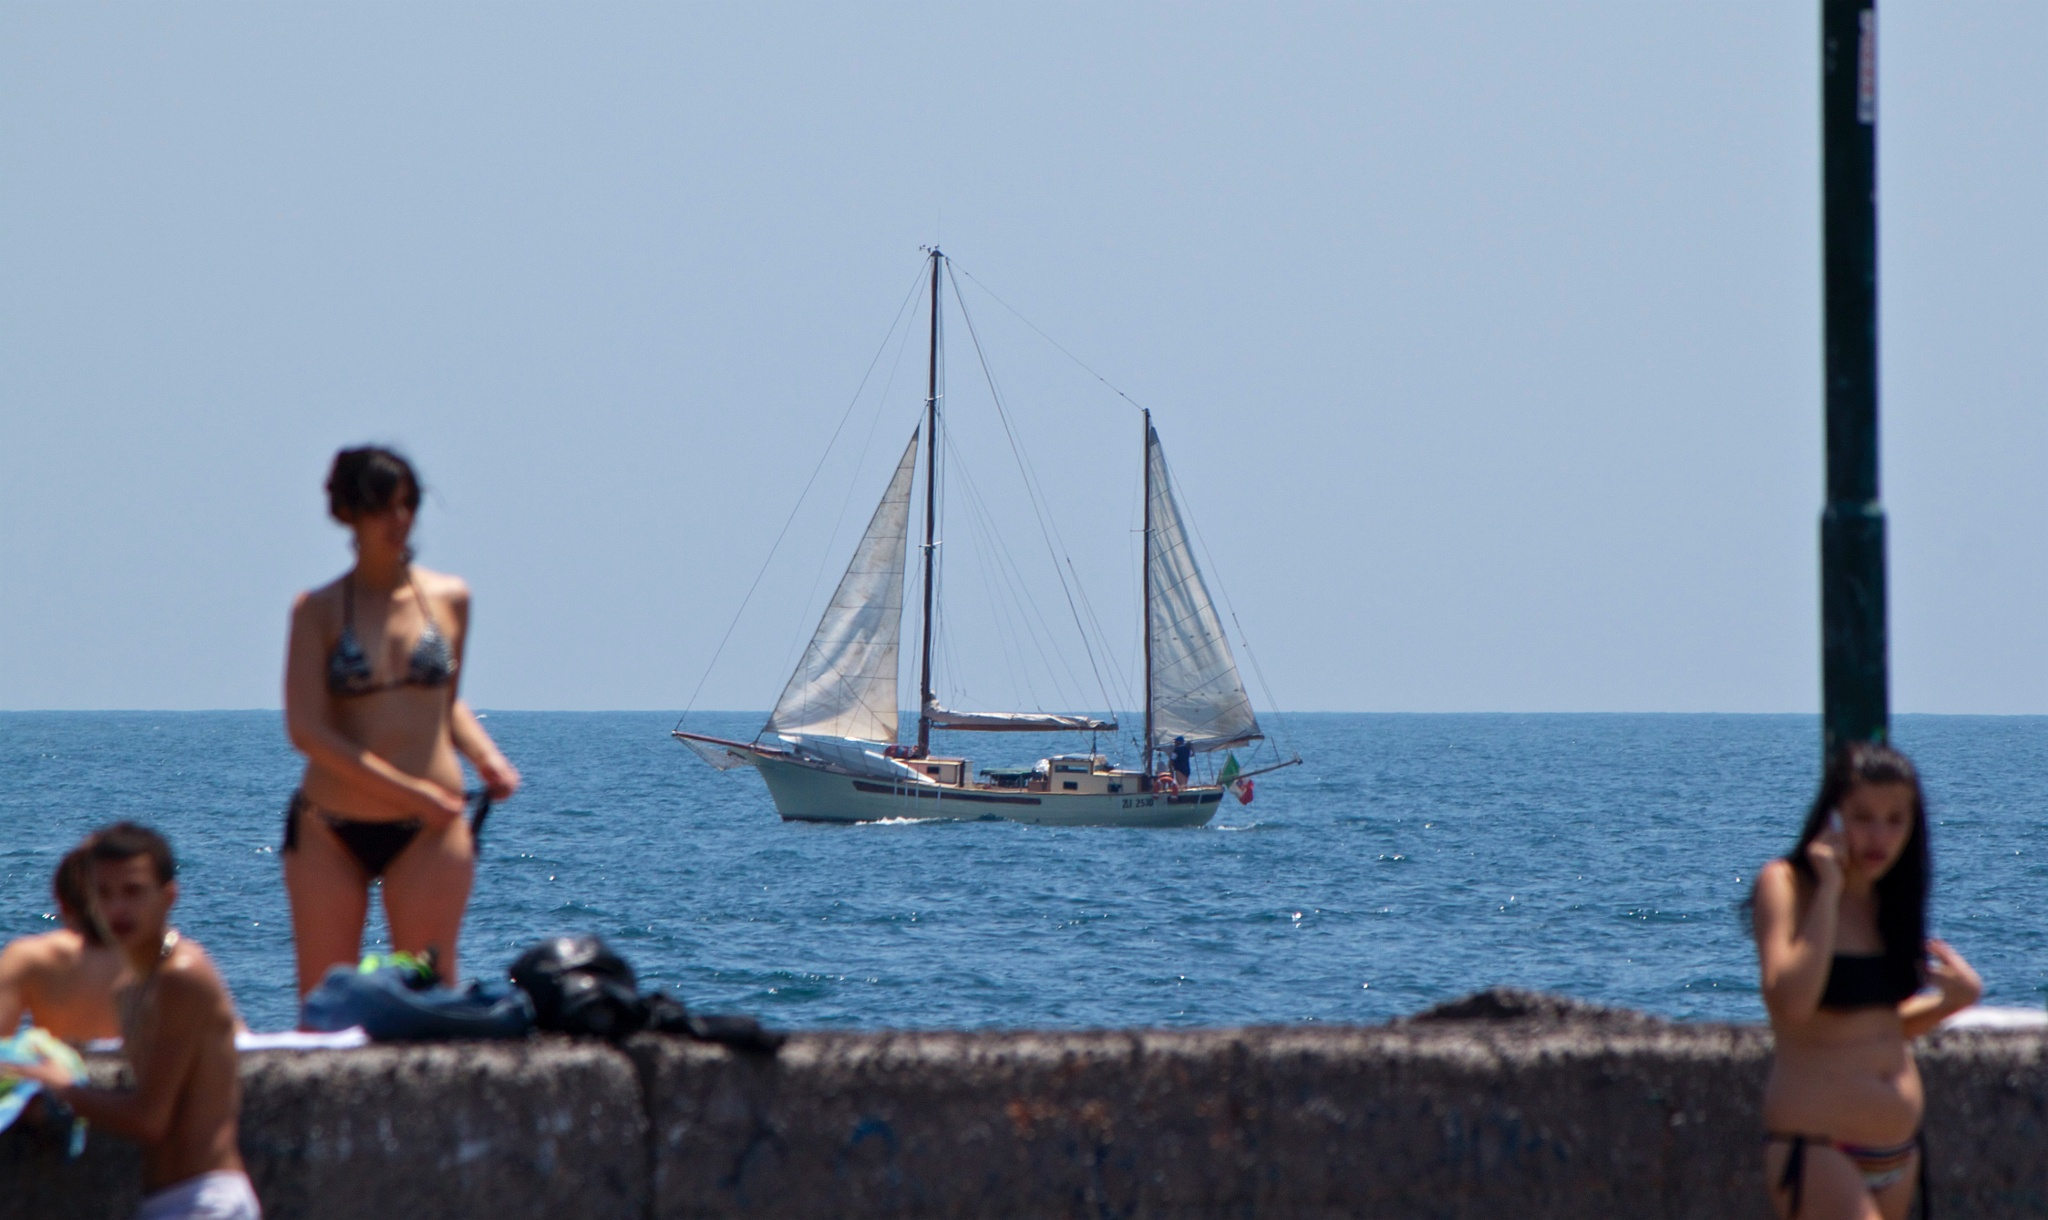 sailing yacht by paolotomaselloct